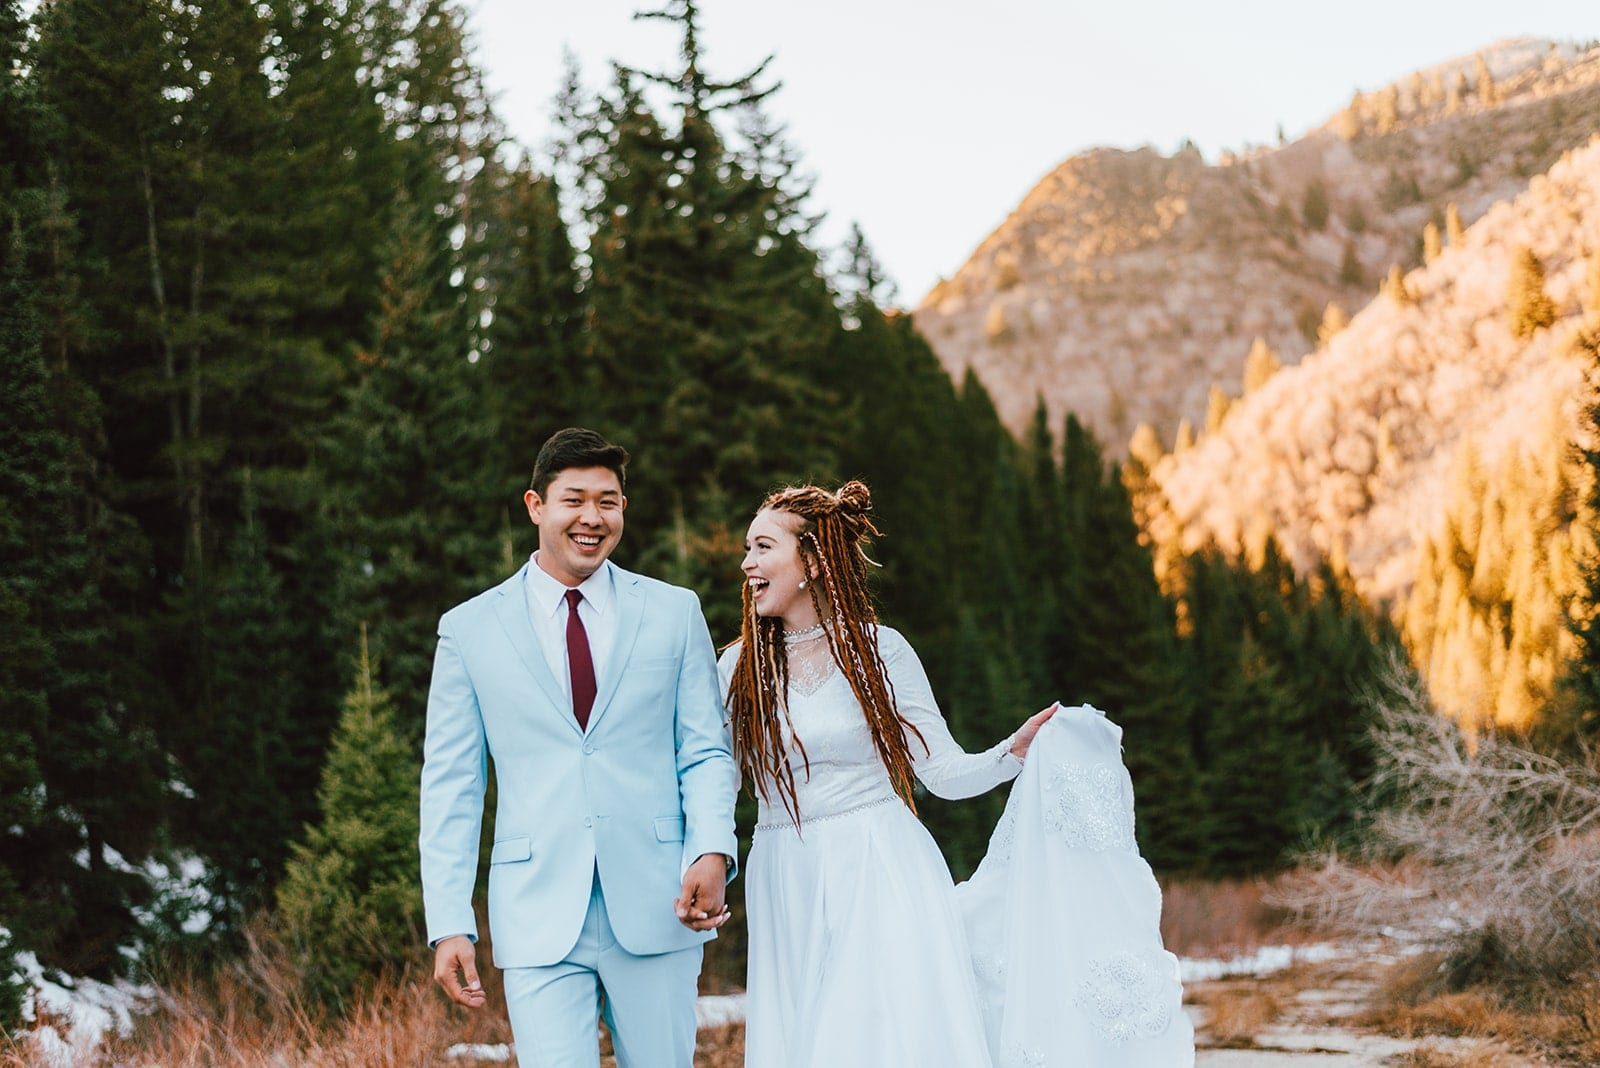 Love Brittny wedding photography jordan pines